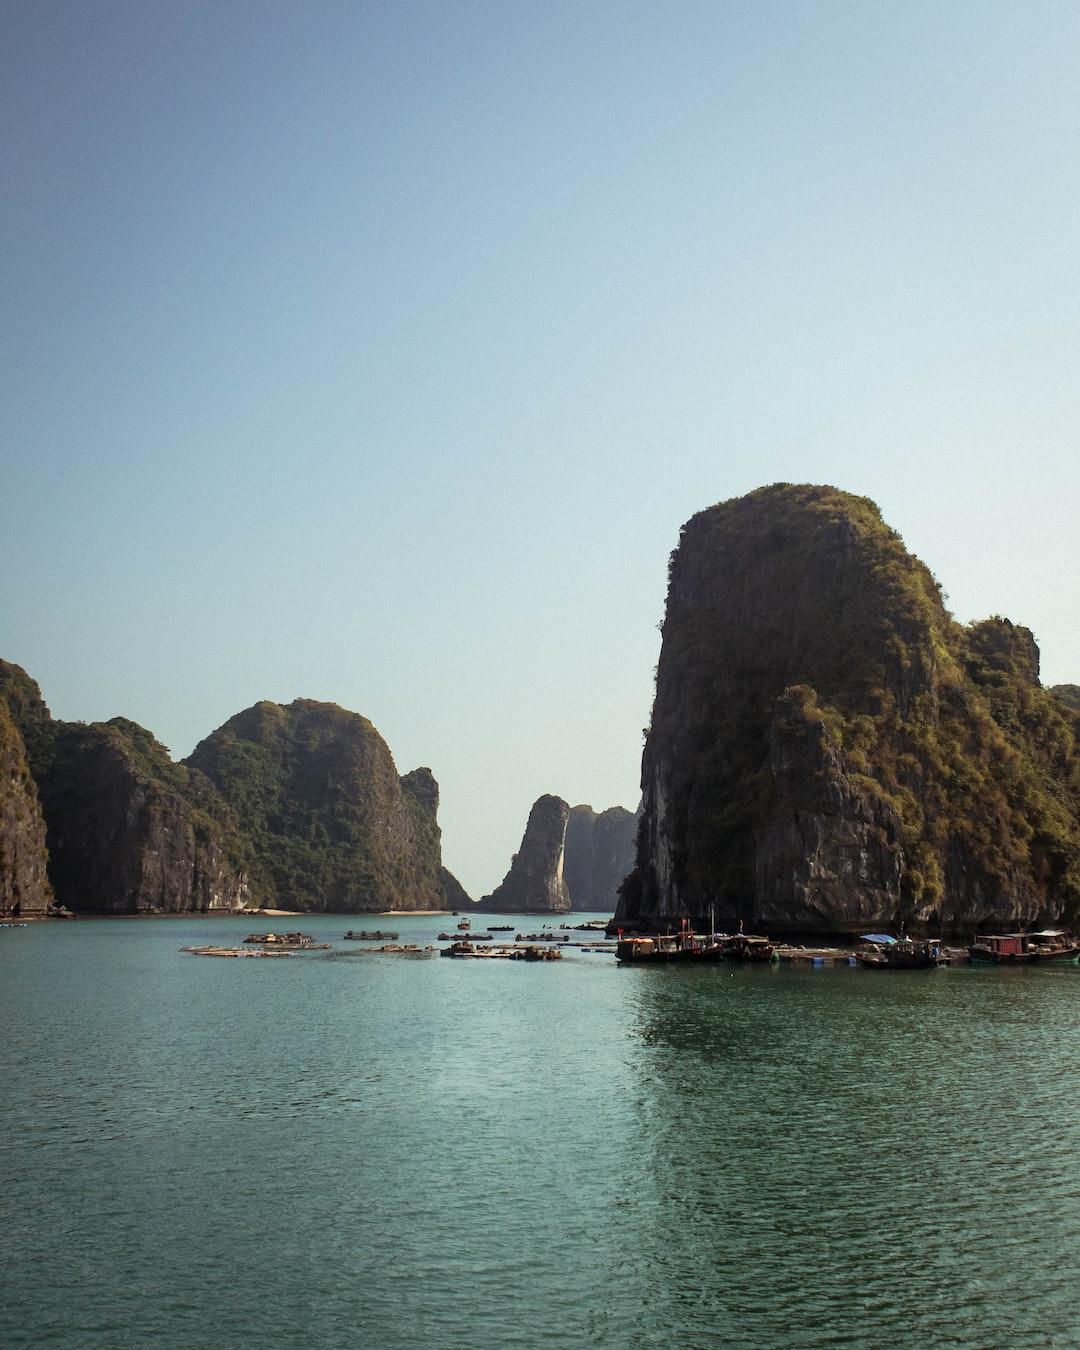 Traveling through Ha Long Bay, Vietnam by boat.